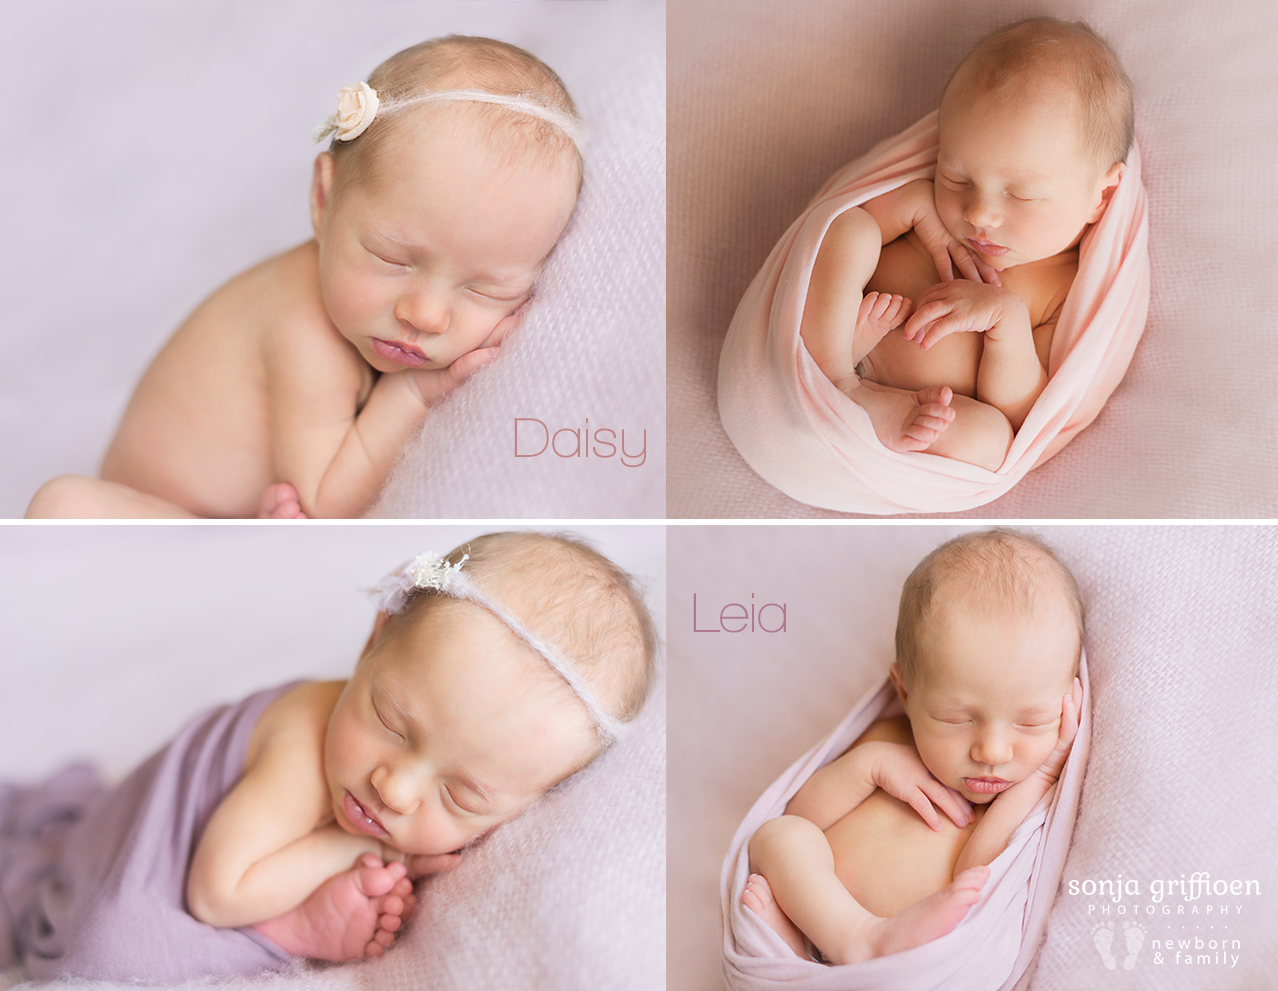 Leia-Daisy-Newborn-Brisbane-Newborn-Photographer-Sonja-Griffioen-copy.jpg